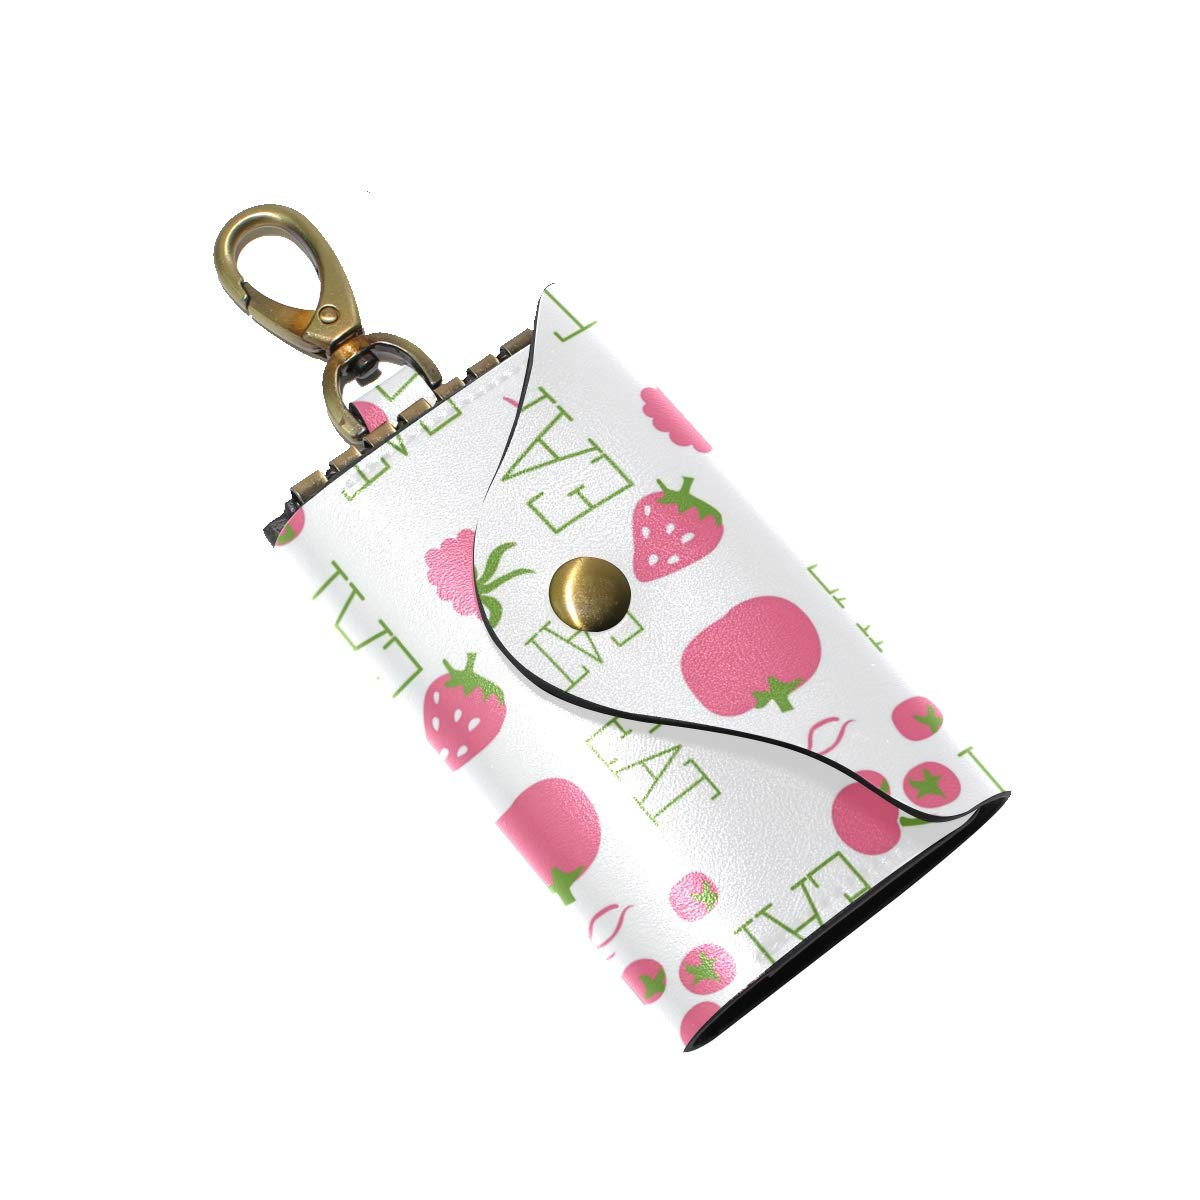 KEAKIA Pattern Leather Key Case Wallets Tri-fold Key Holder Keychains with 6 Hooks 2 Slot Snap Closure for Men Women